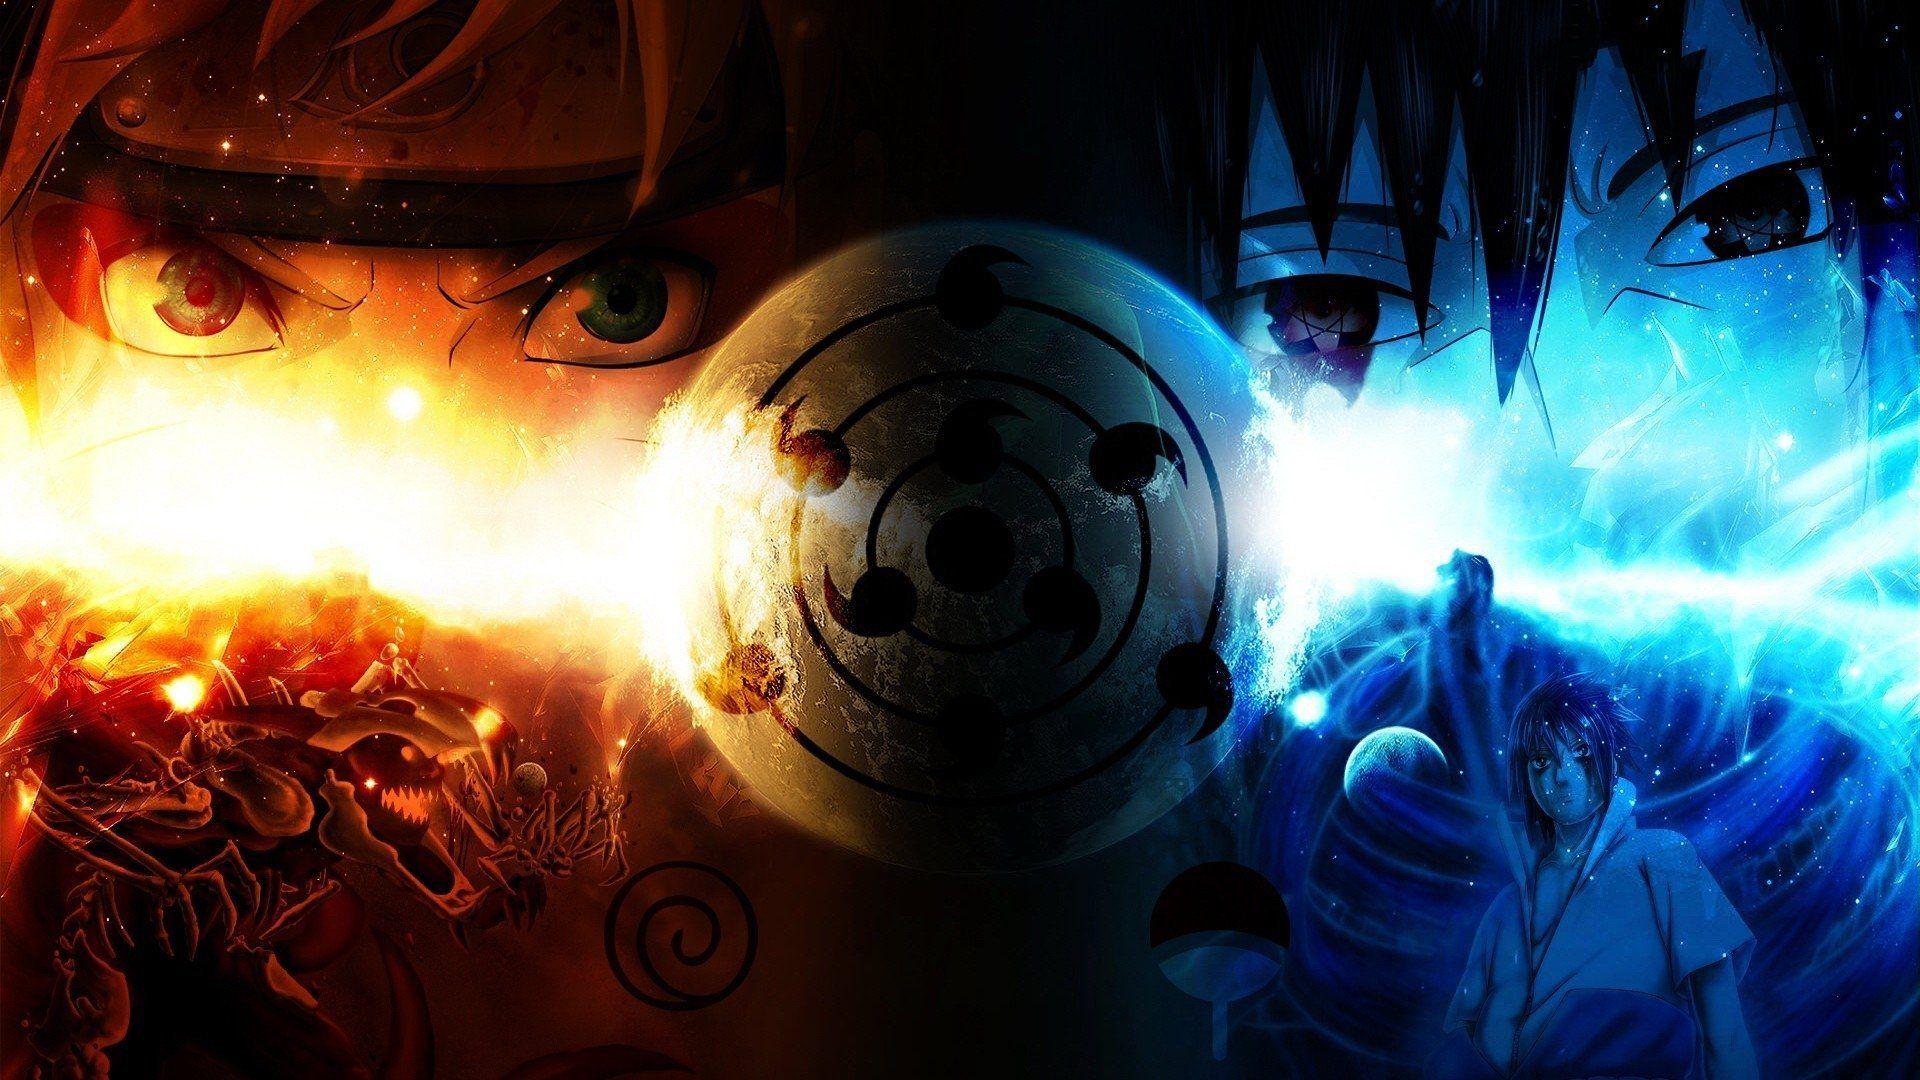 Manga Anime Wallpaper 1 HD Art Epic Heroes Video